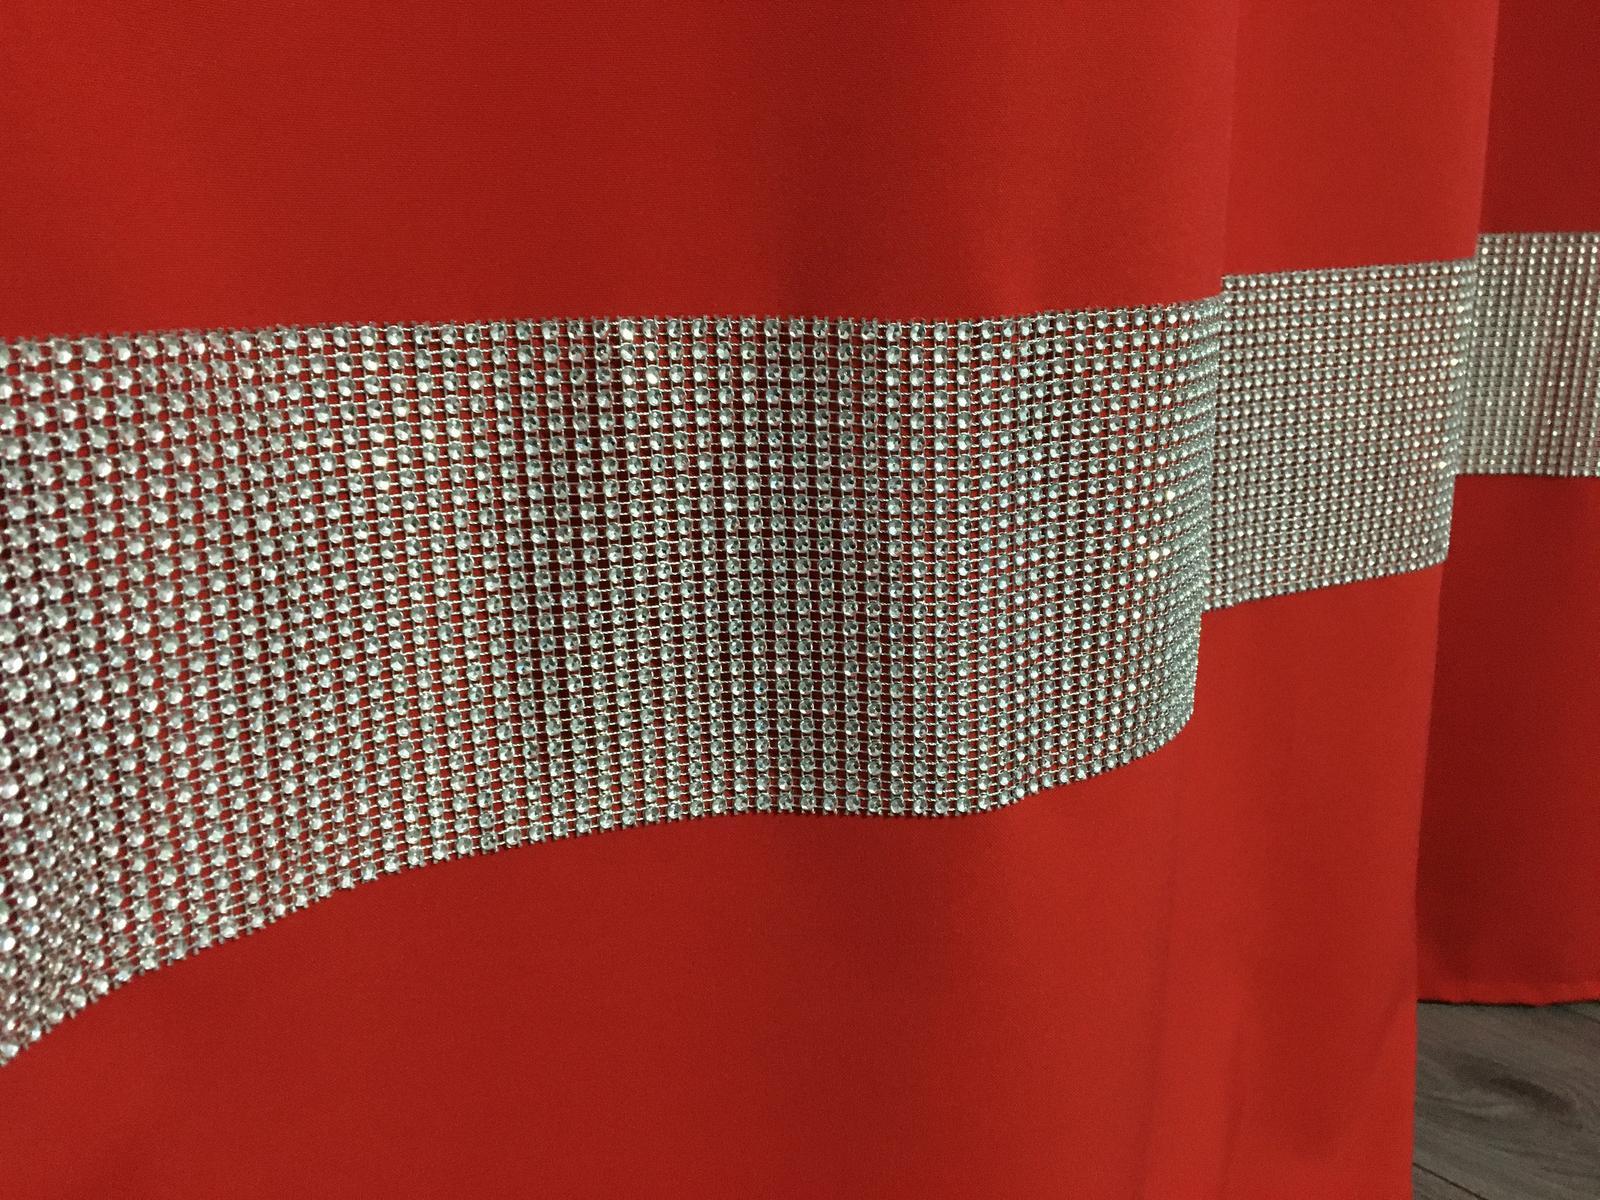 Tieniaci cerveny zaves so zirkonmi - Obrázok č. 1